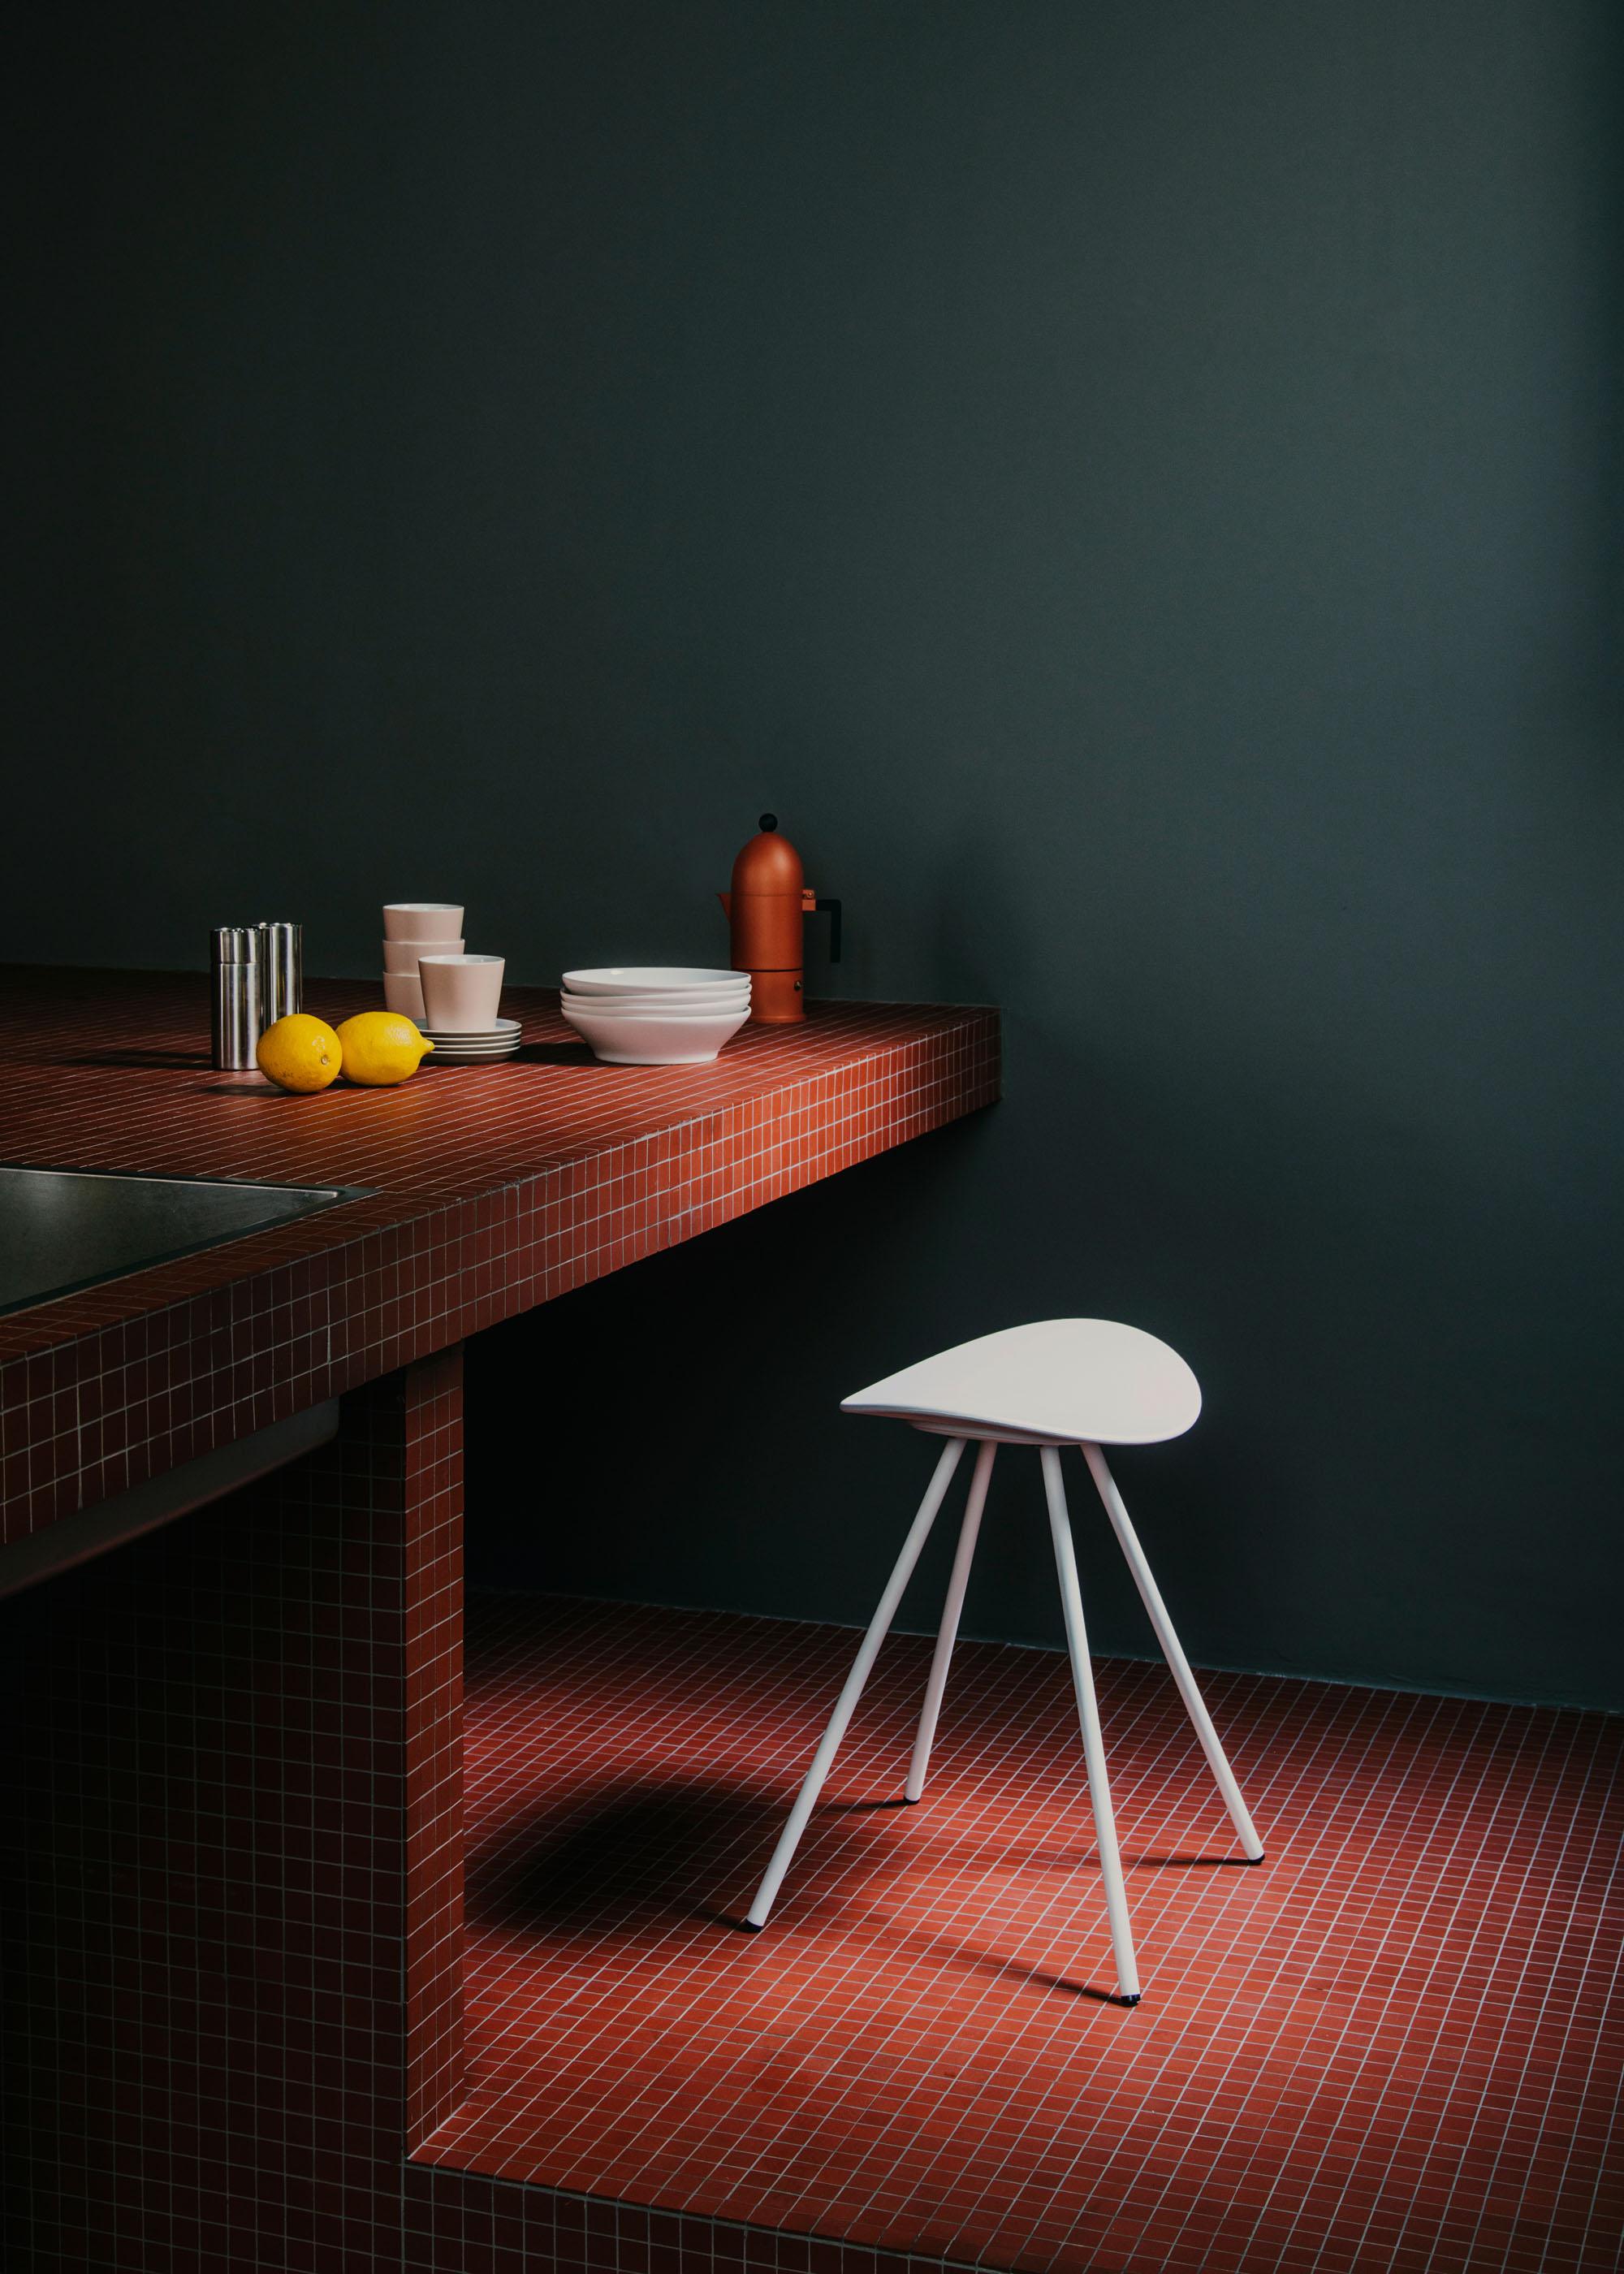 #furniture #enea #design #clase #kitchen #arquitectura #g #interiors